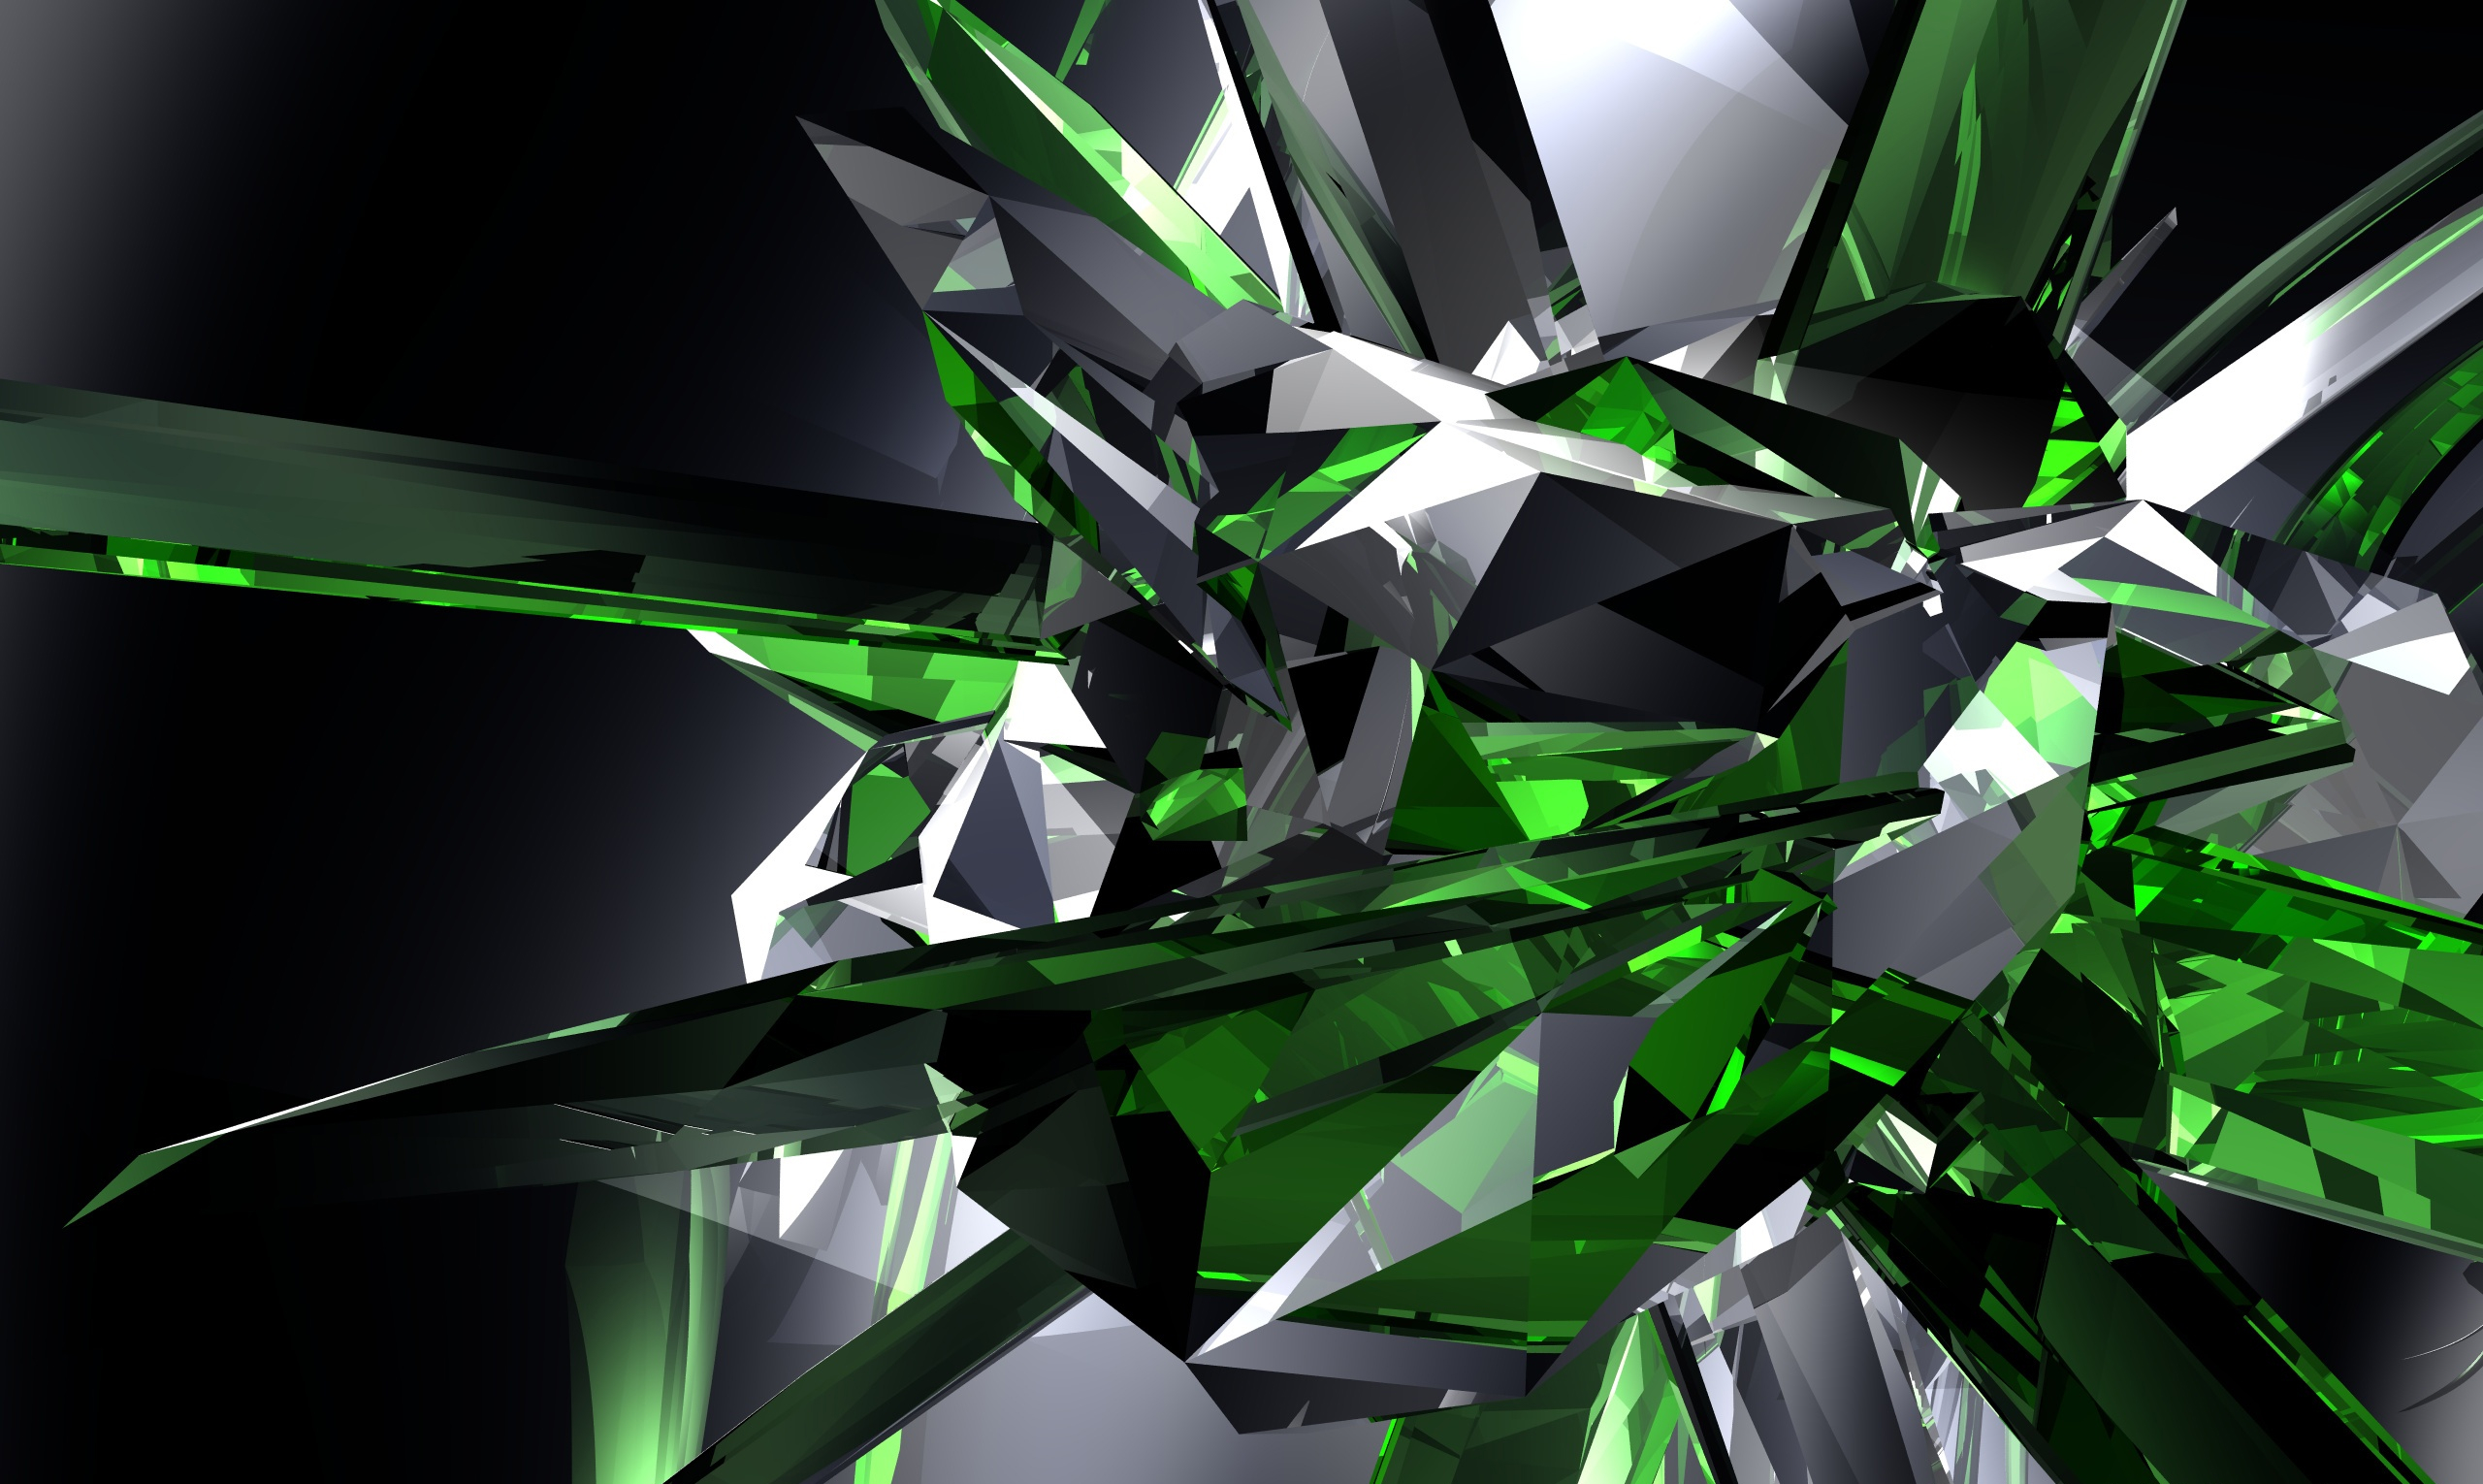 Digital Art Full HD Wallpaper And Background Image